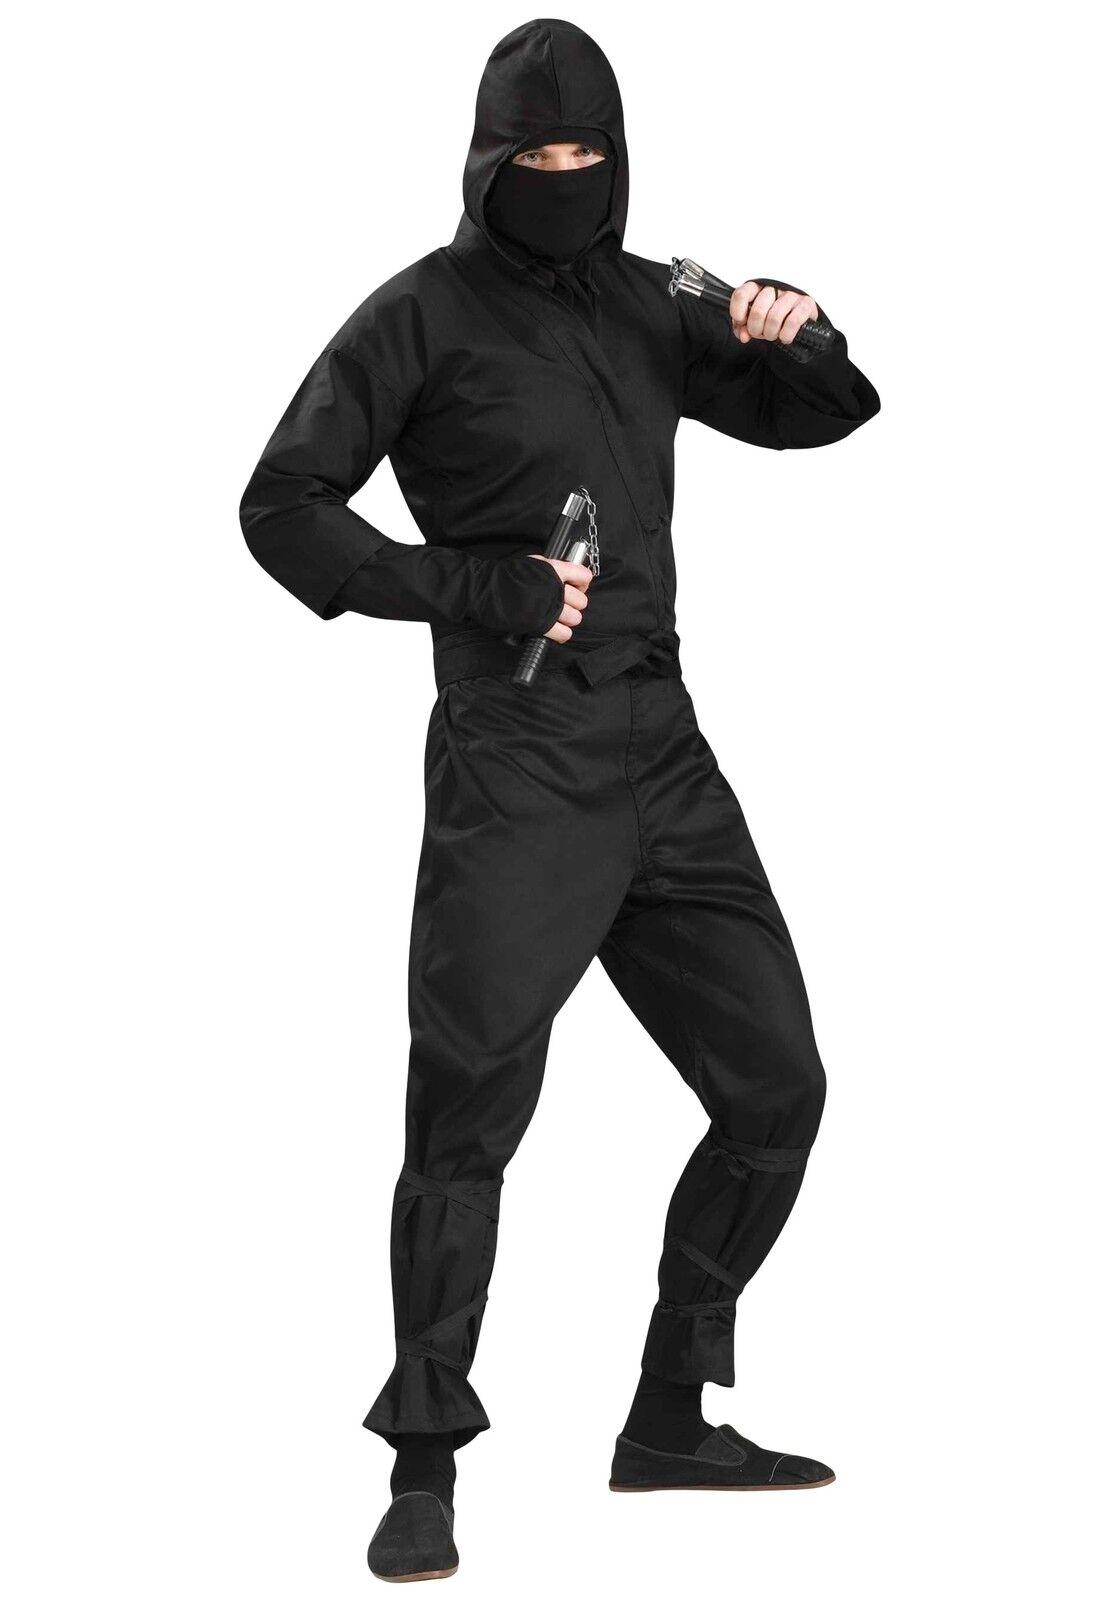 Ninja Costume Buying Guide